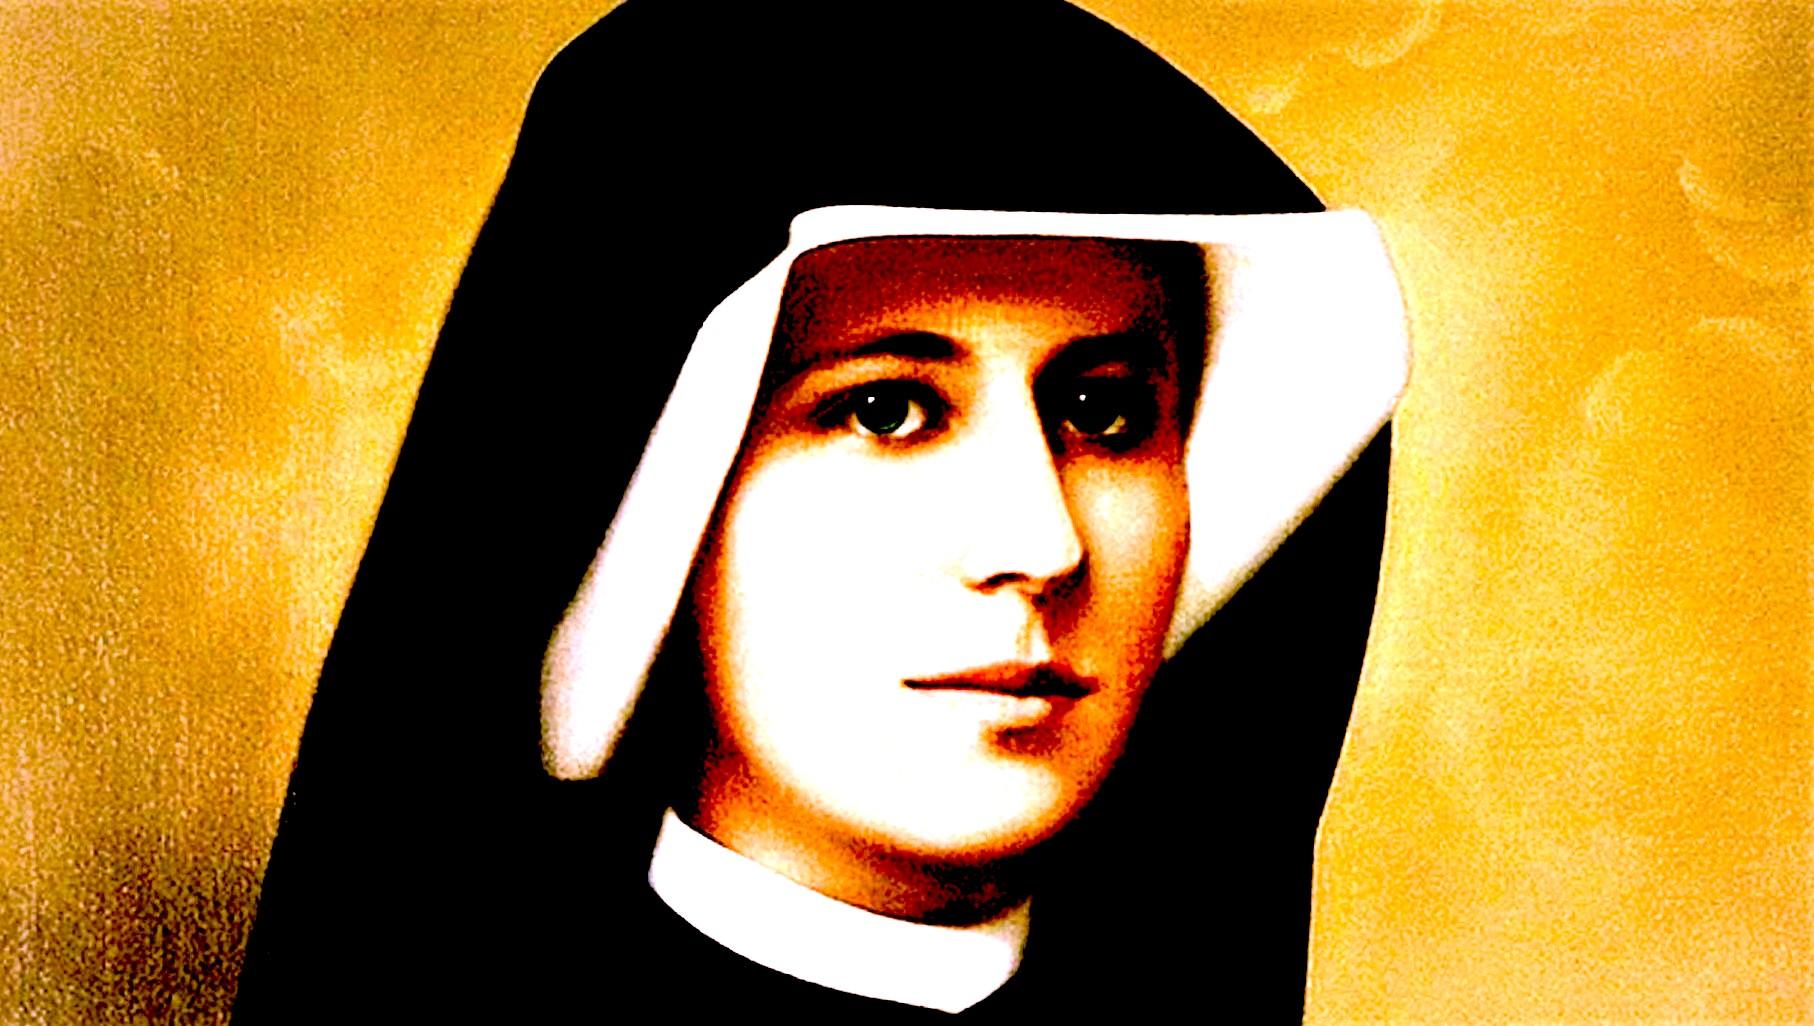 DIJETE, ŽELIM TE POUČITI...'Čudesne tajne svetosti koje je Isus otkrio  svetoj Faustini - Dnevno.hr